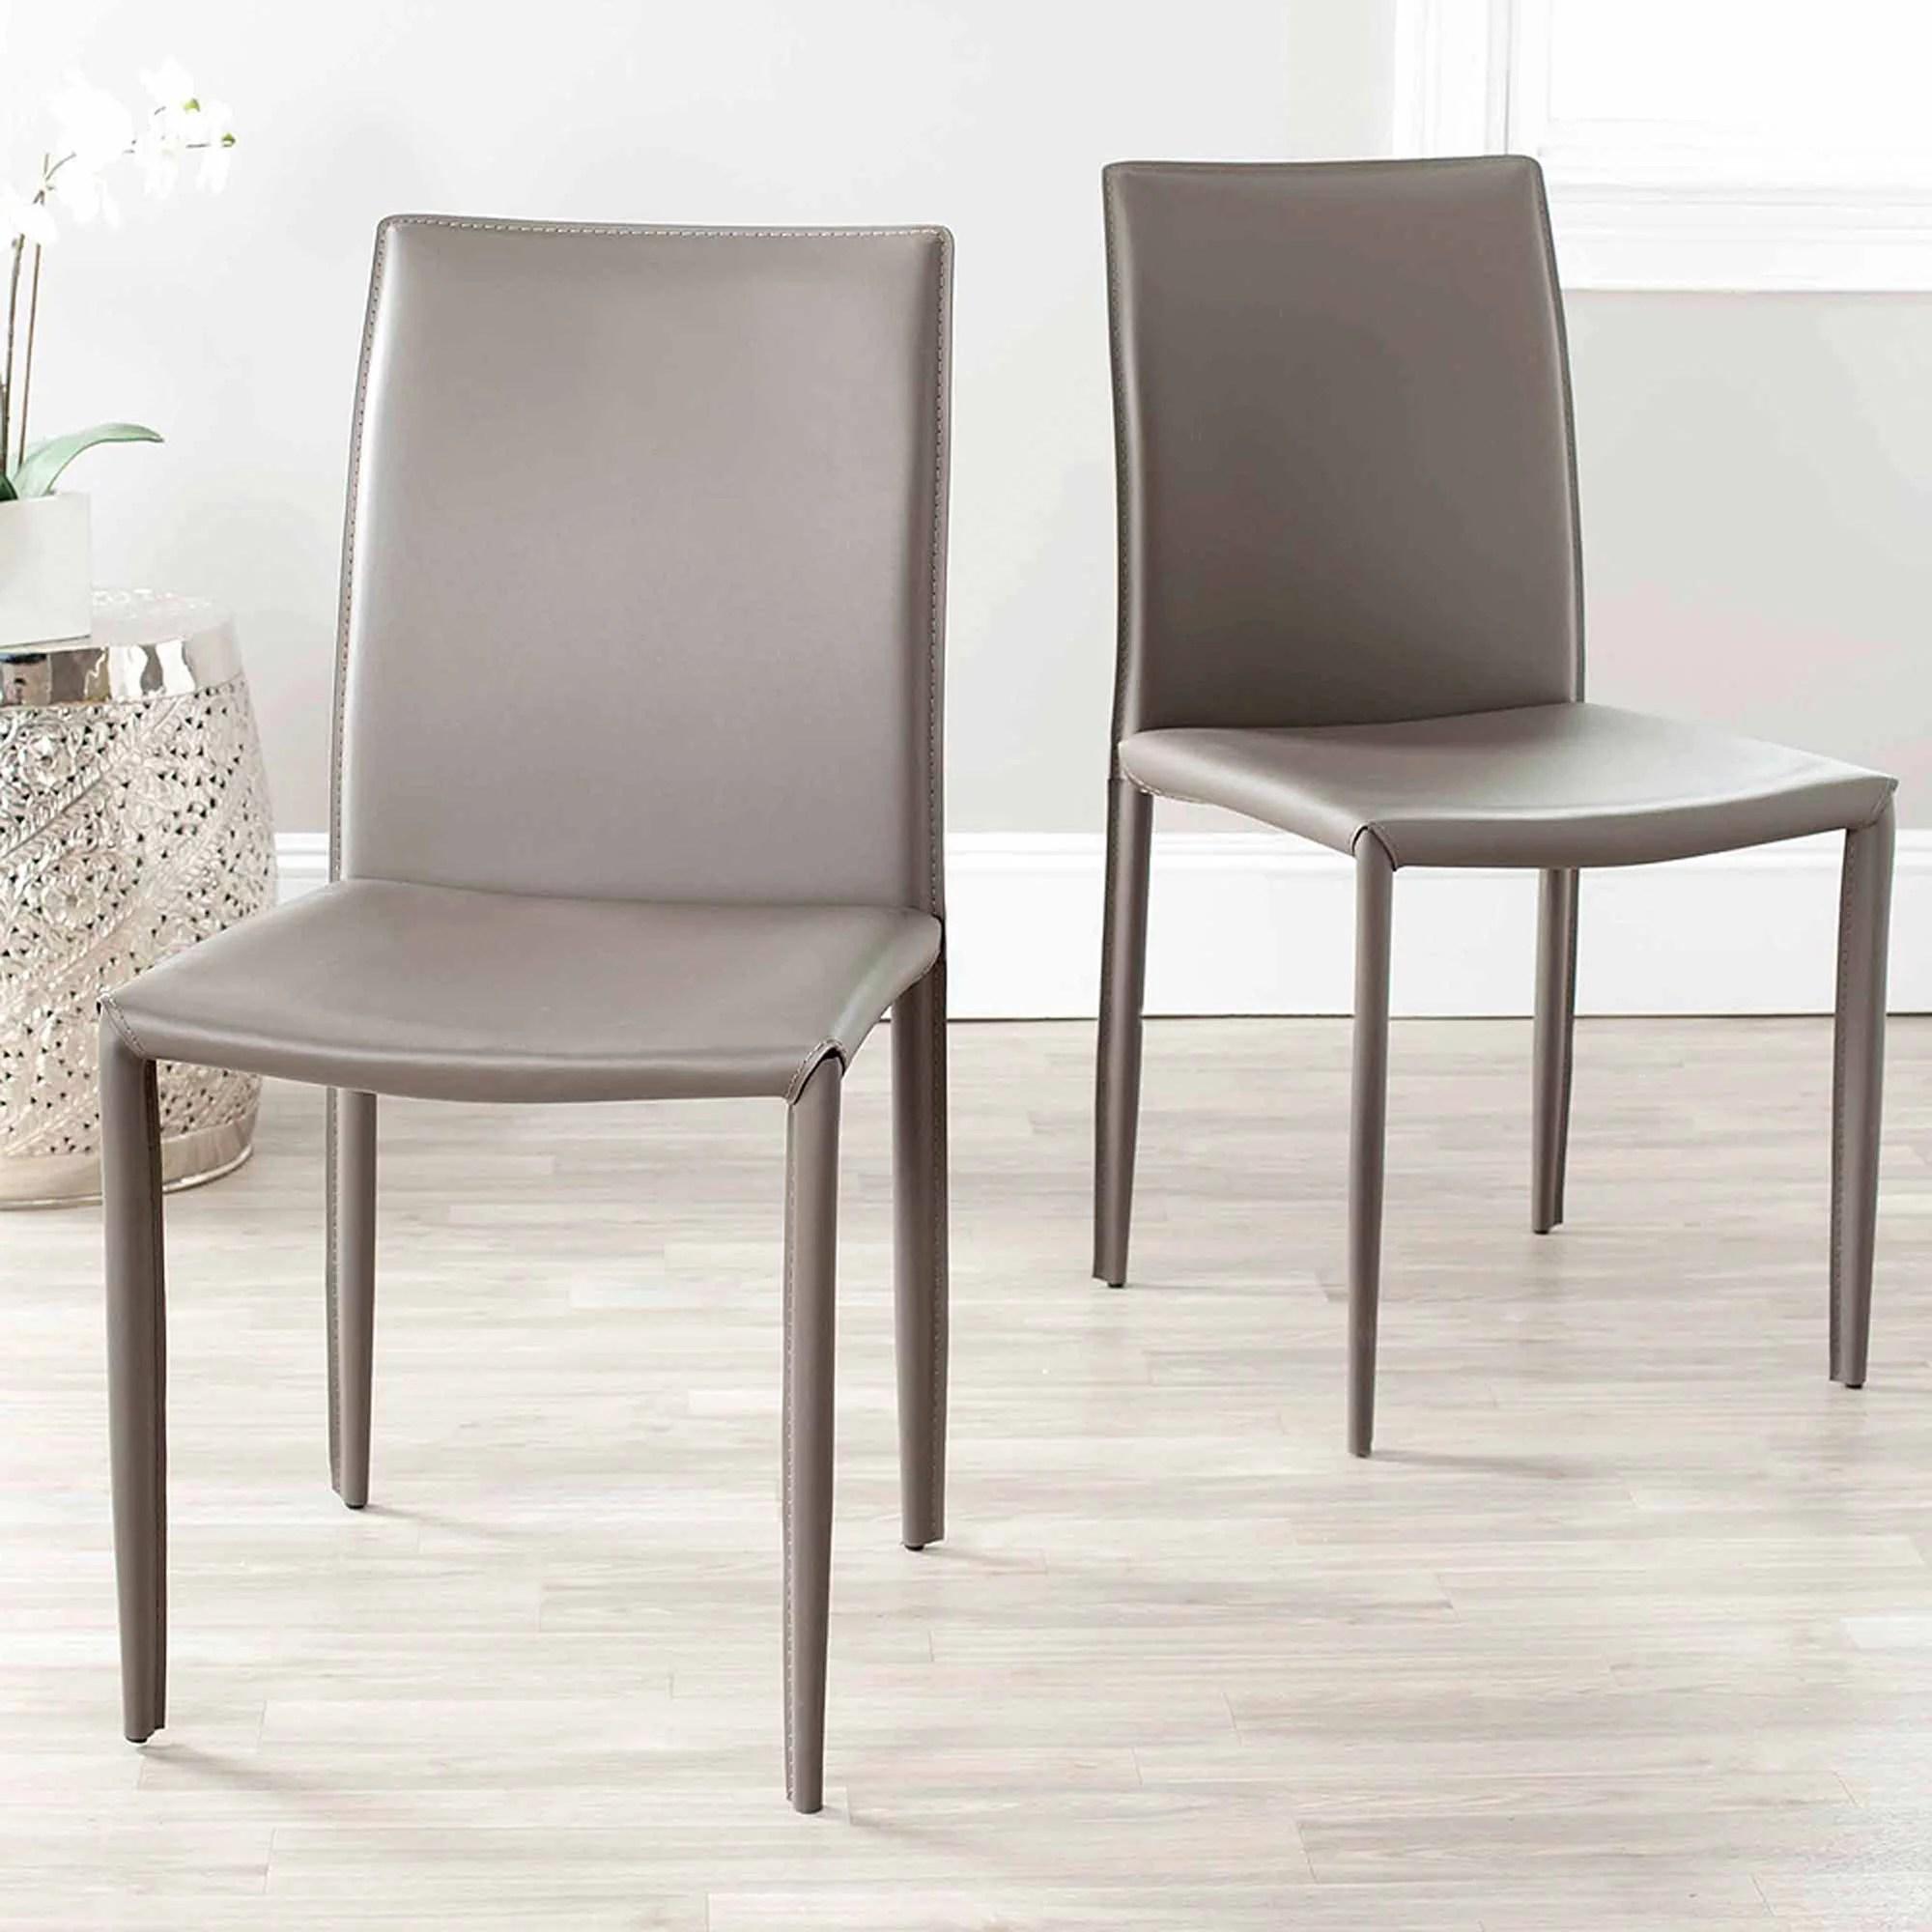 safavieh dining chairs posture seat singapore karna chair set of 2 walmart com